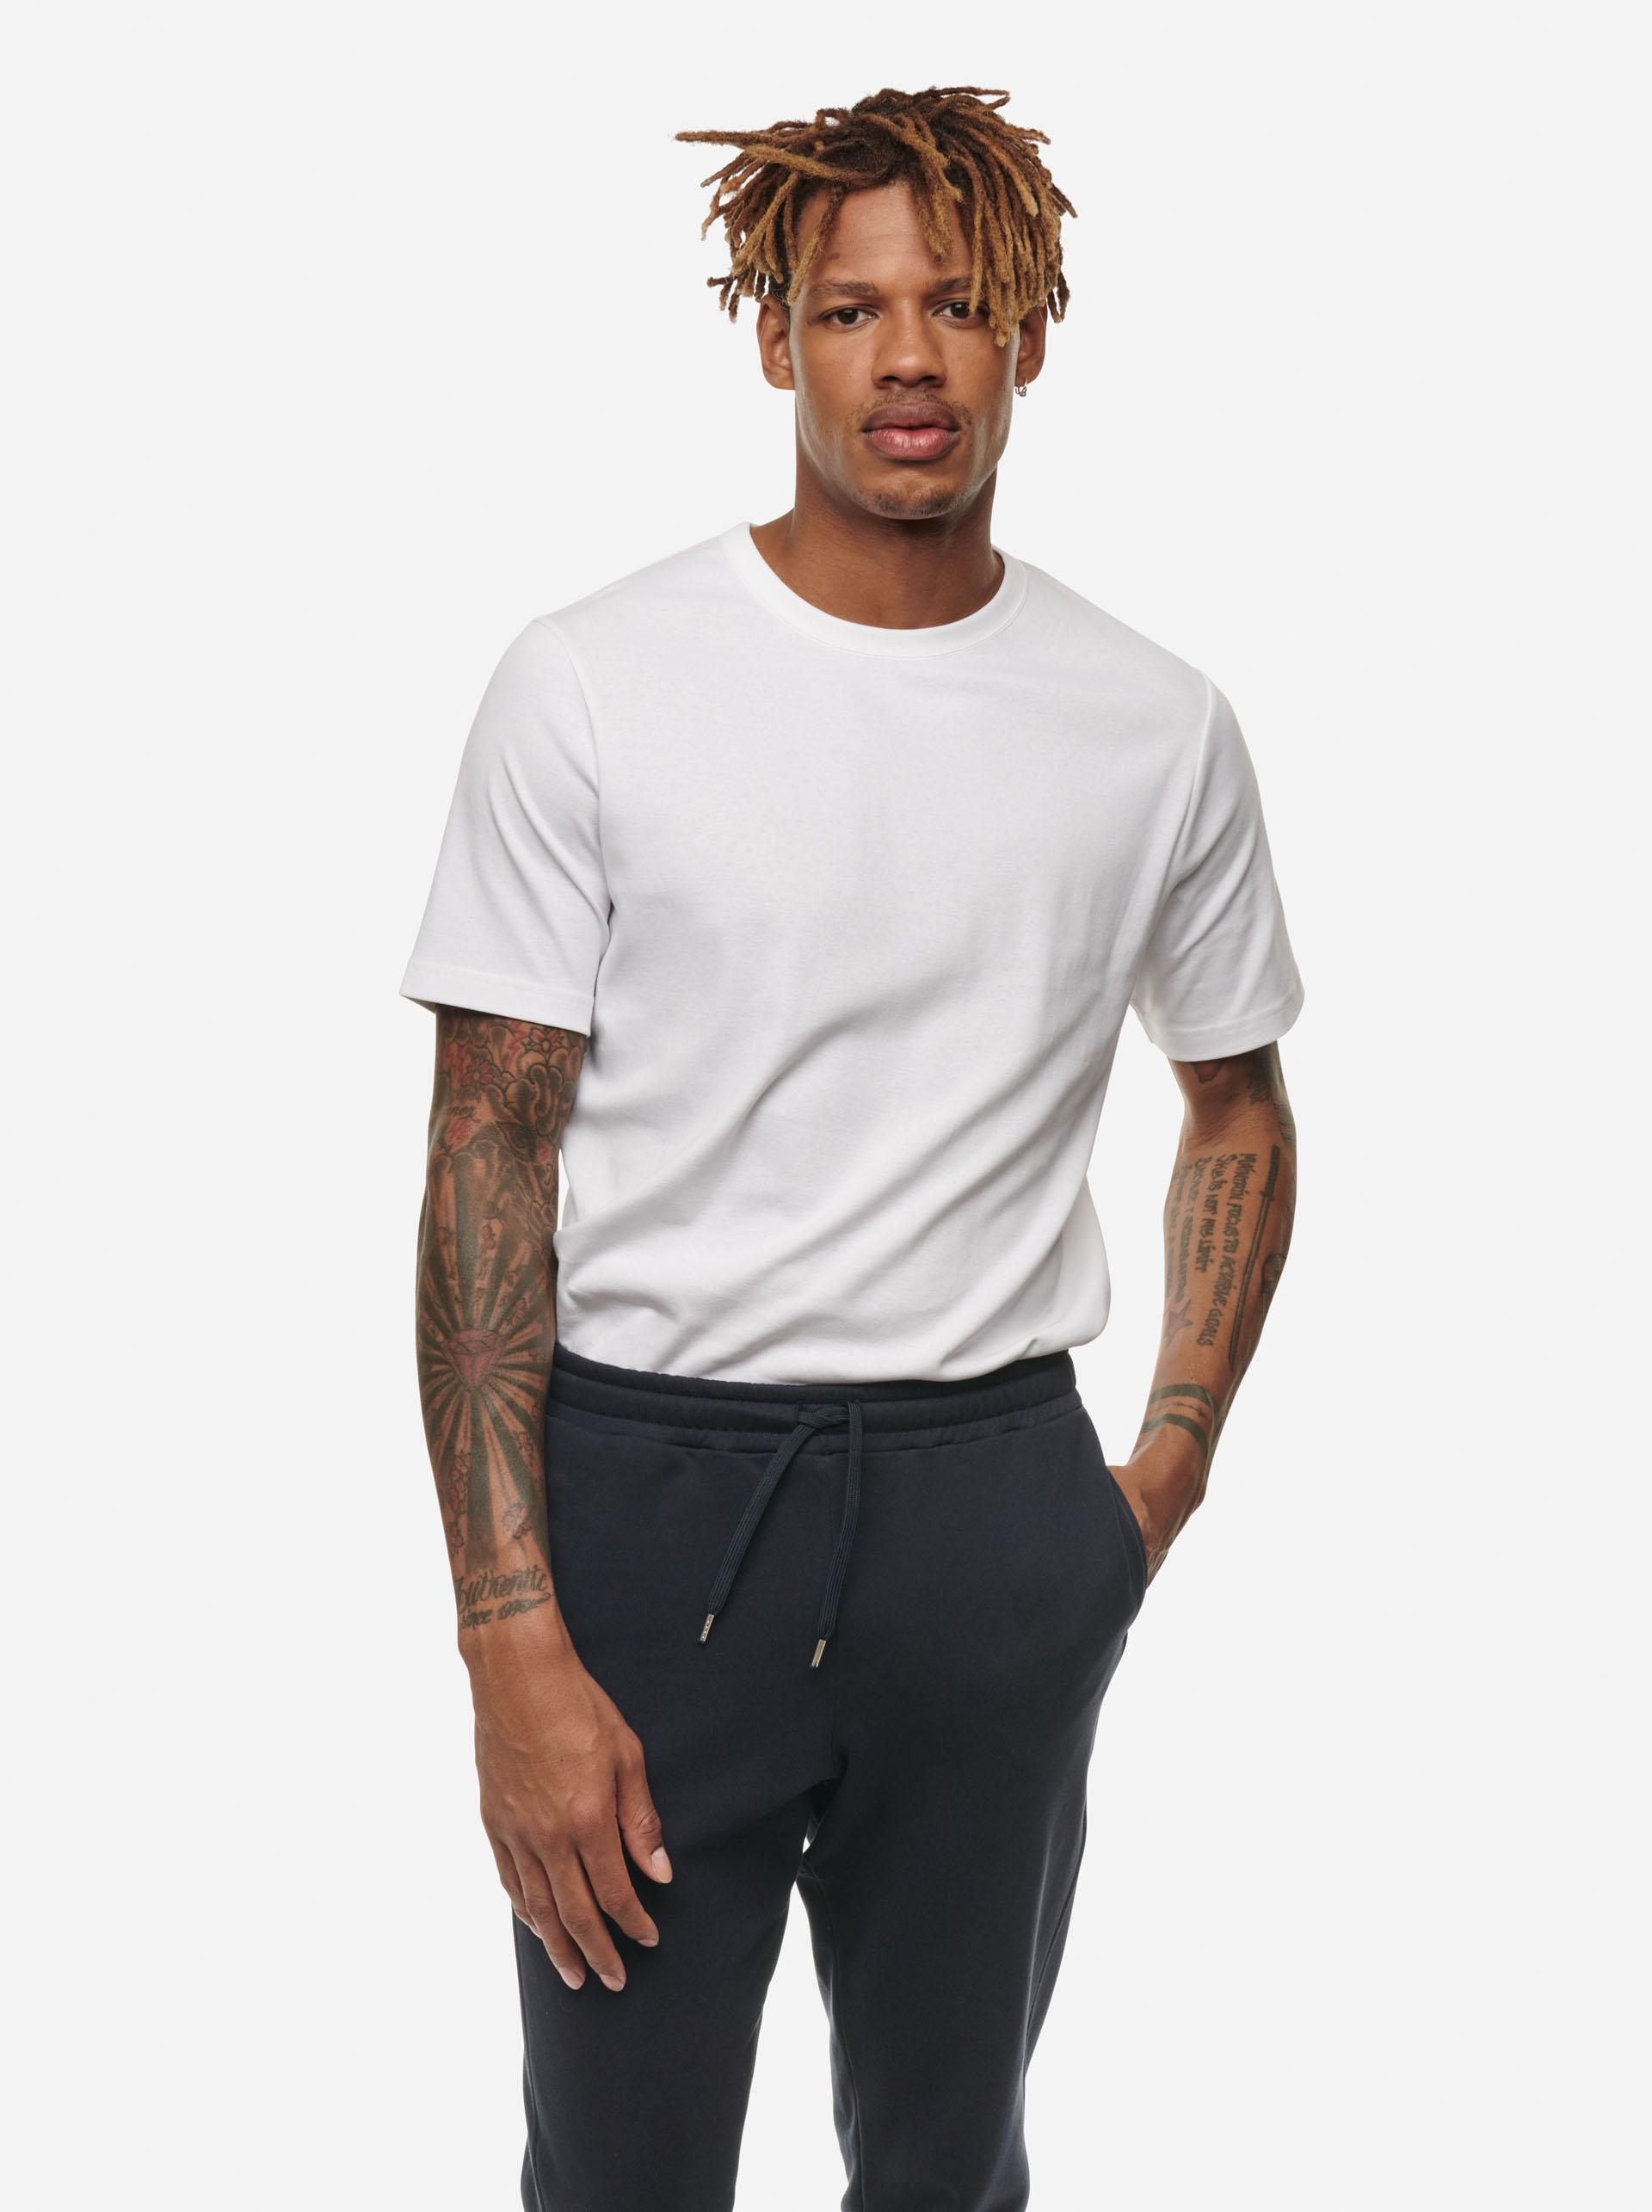 Teym - The-T-Shirt - Men - White - 9